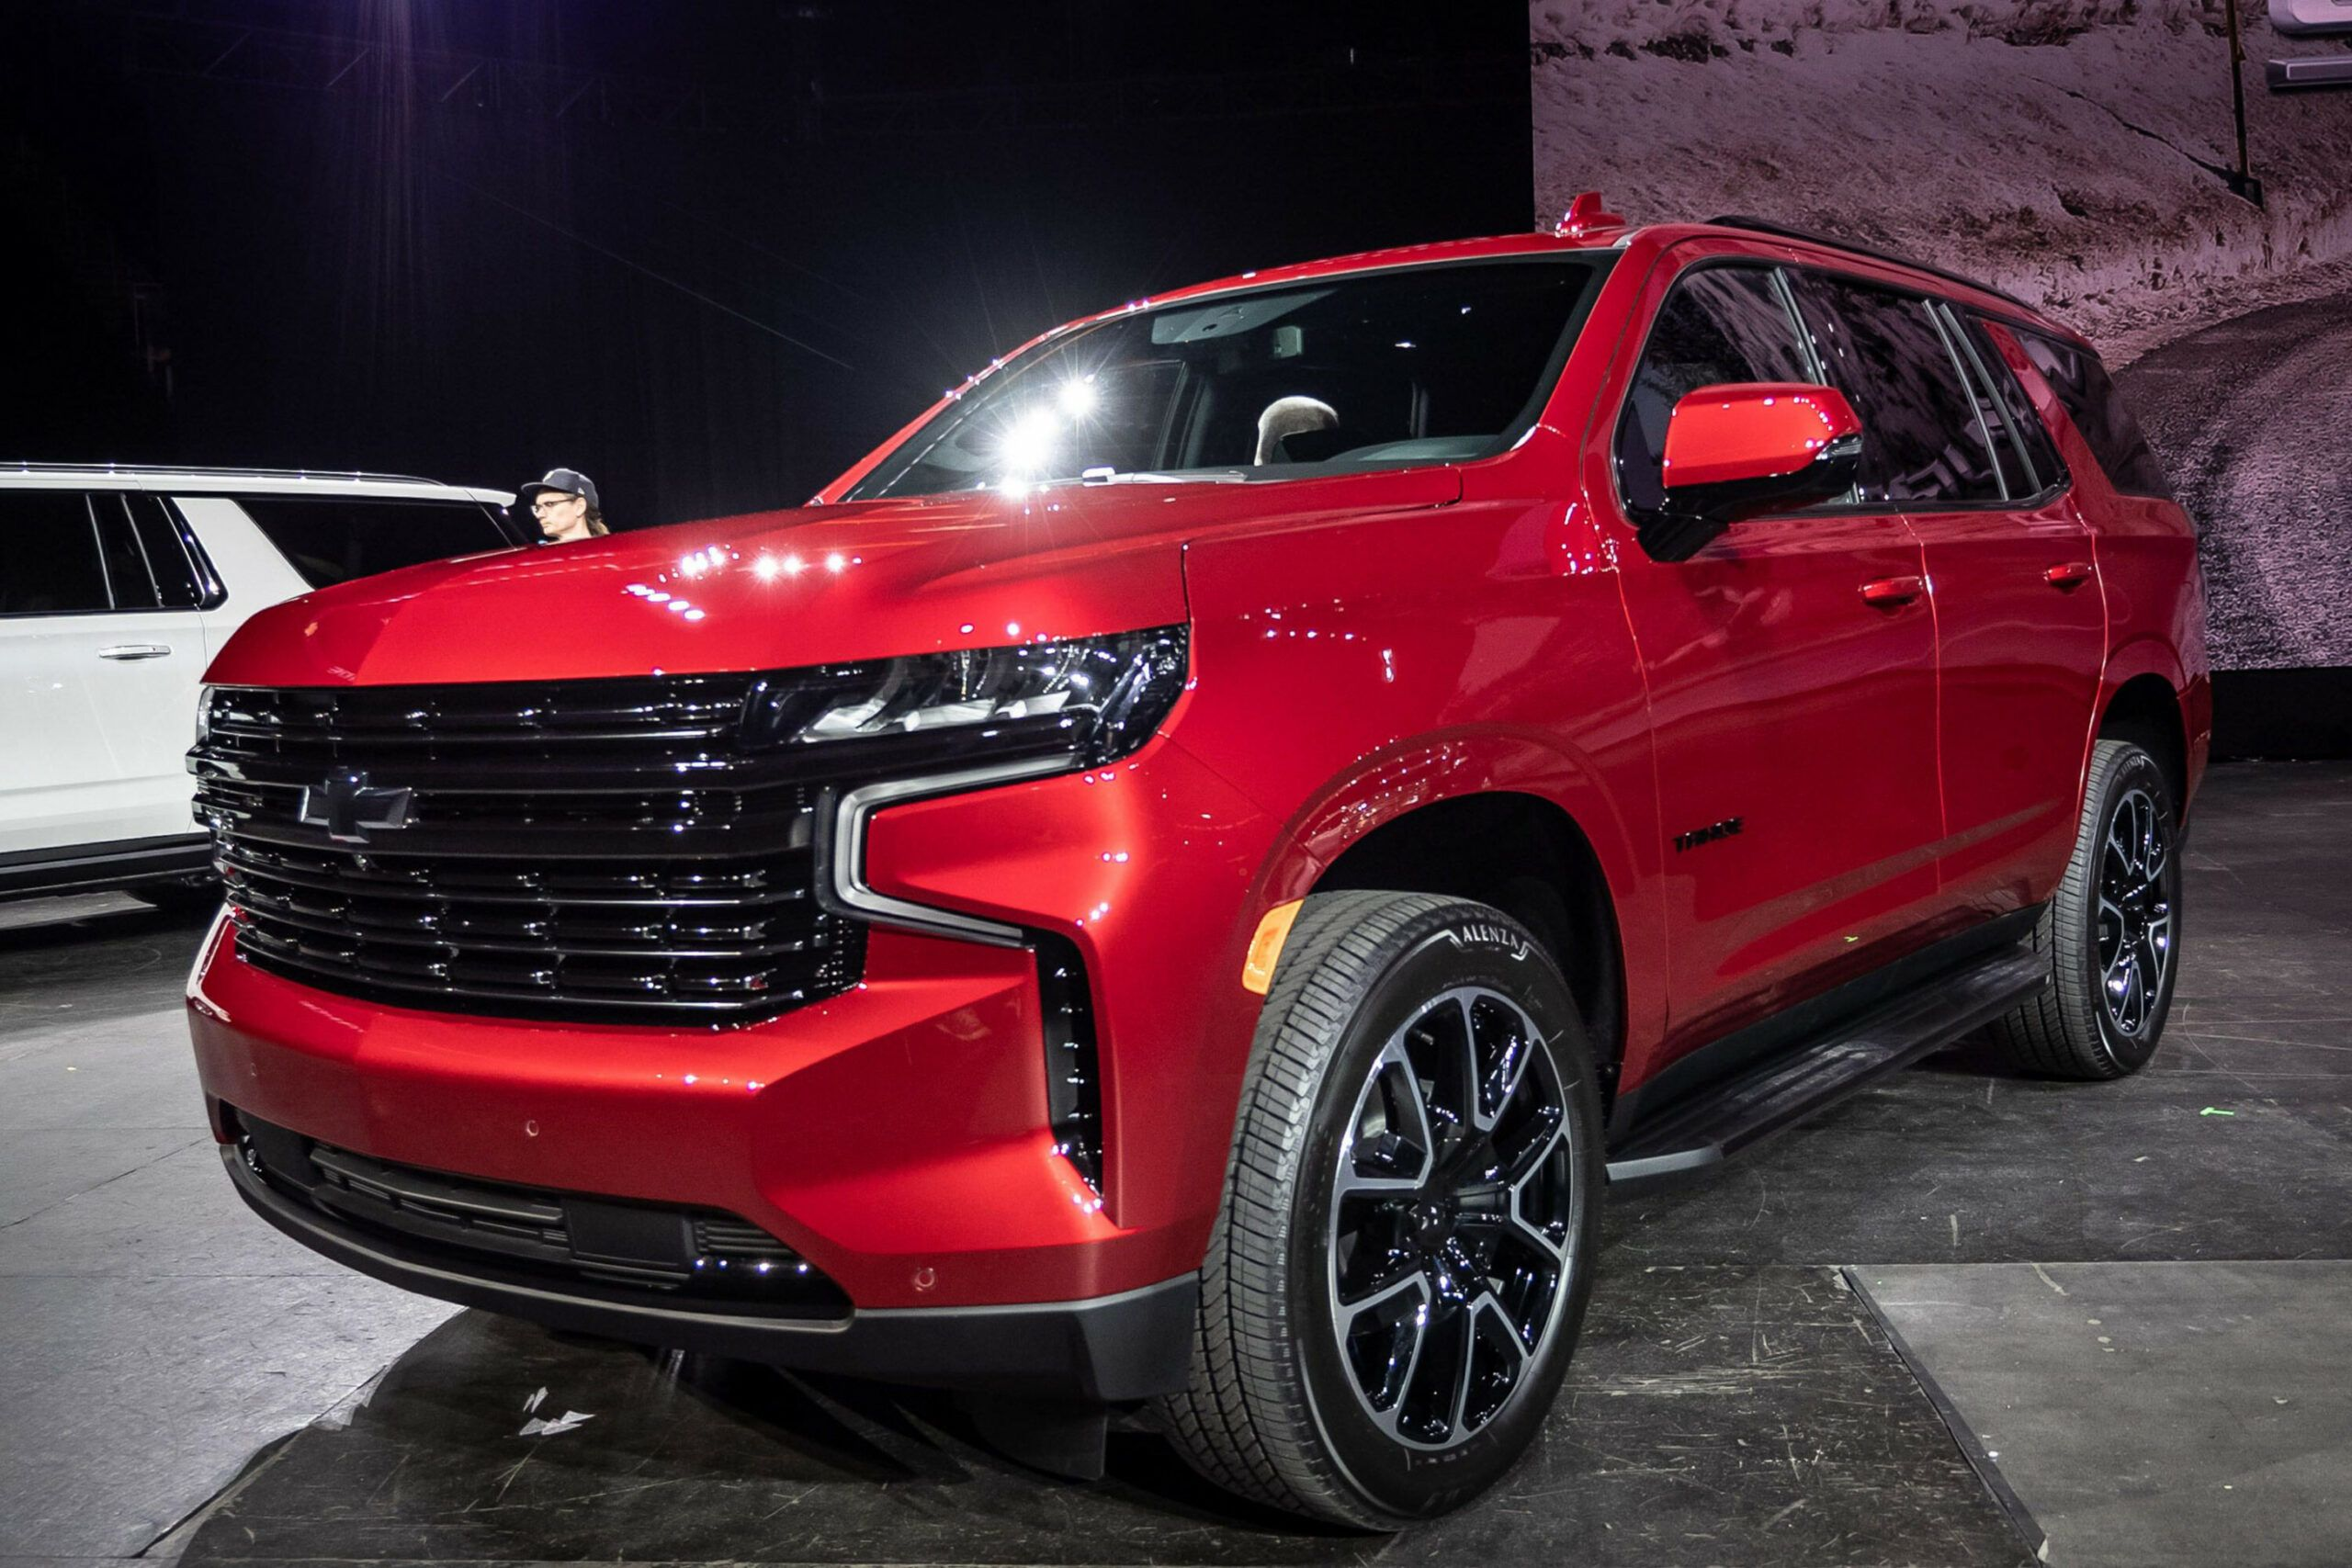 2020 Chevrolet Tahoe Redesign Rumors General Motors Appear The